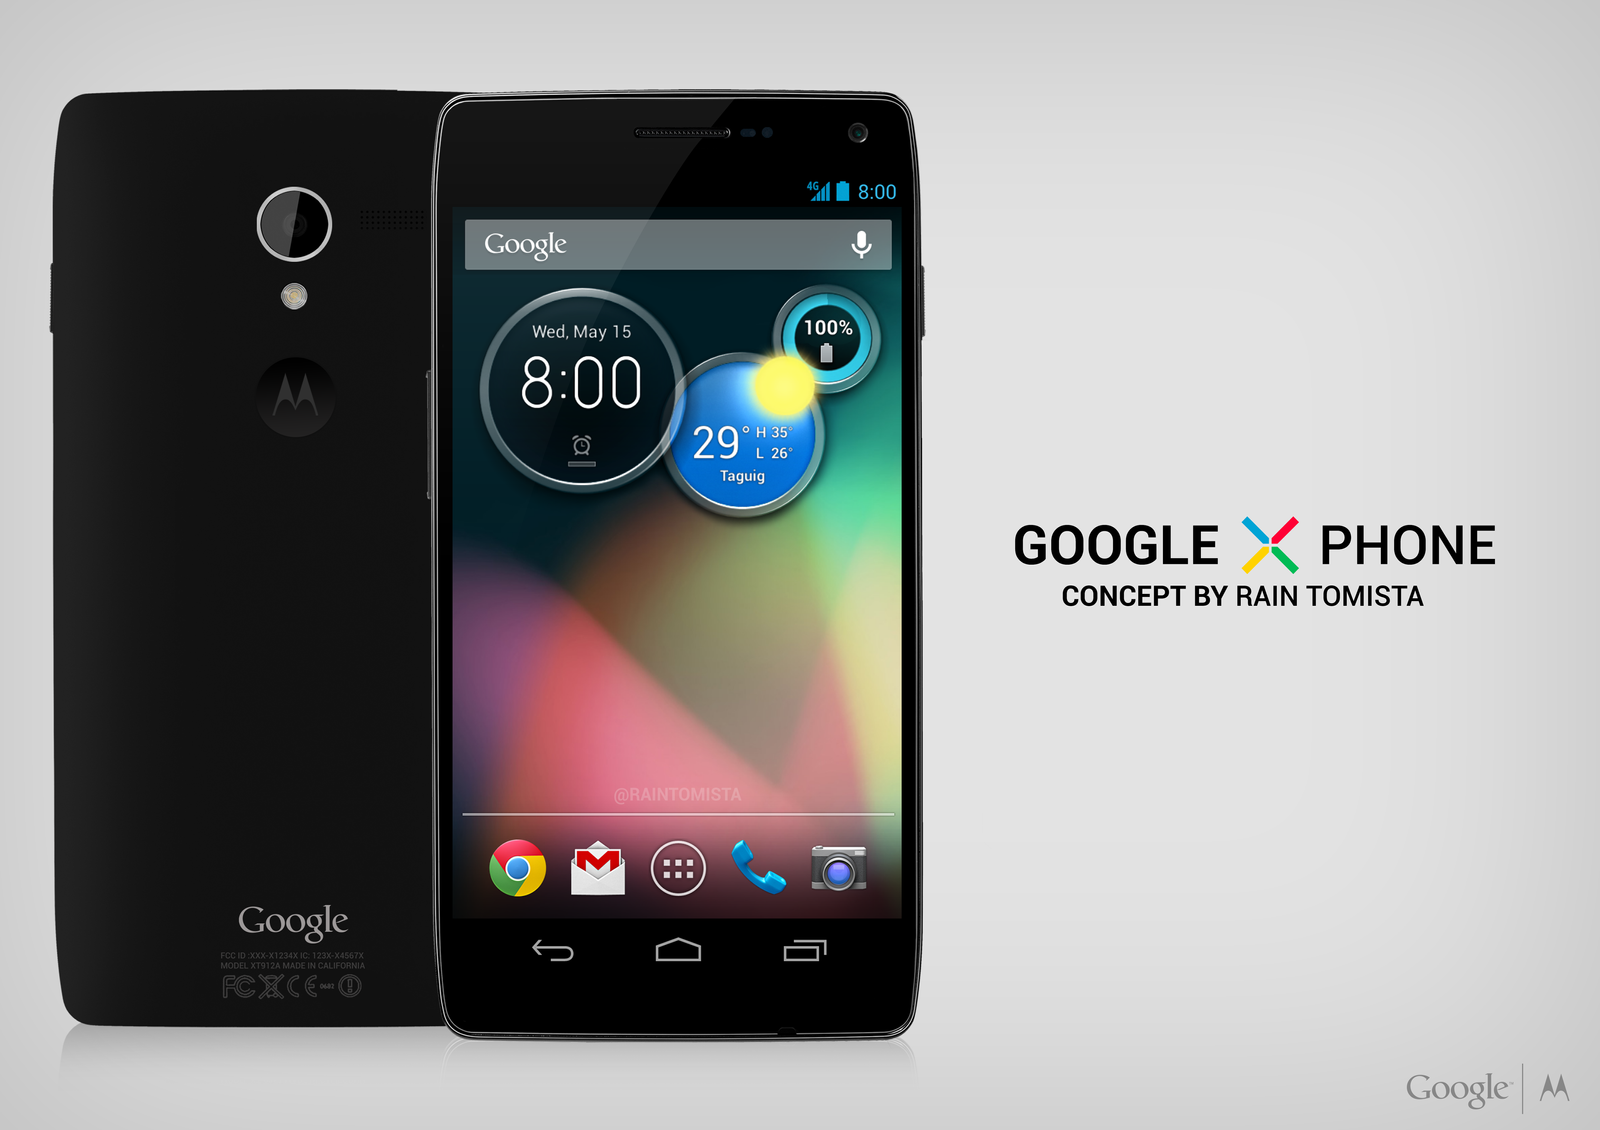 Google X Phone Concept by raintomista